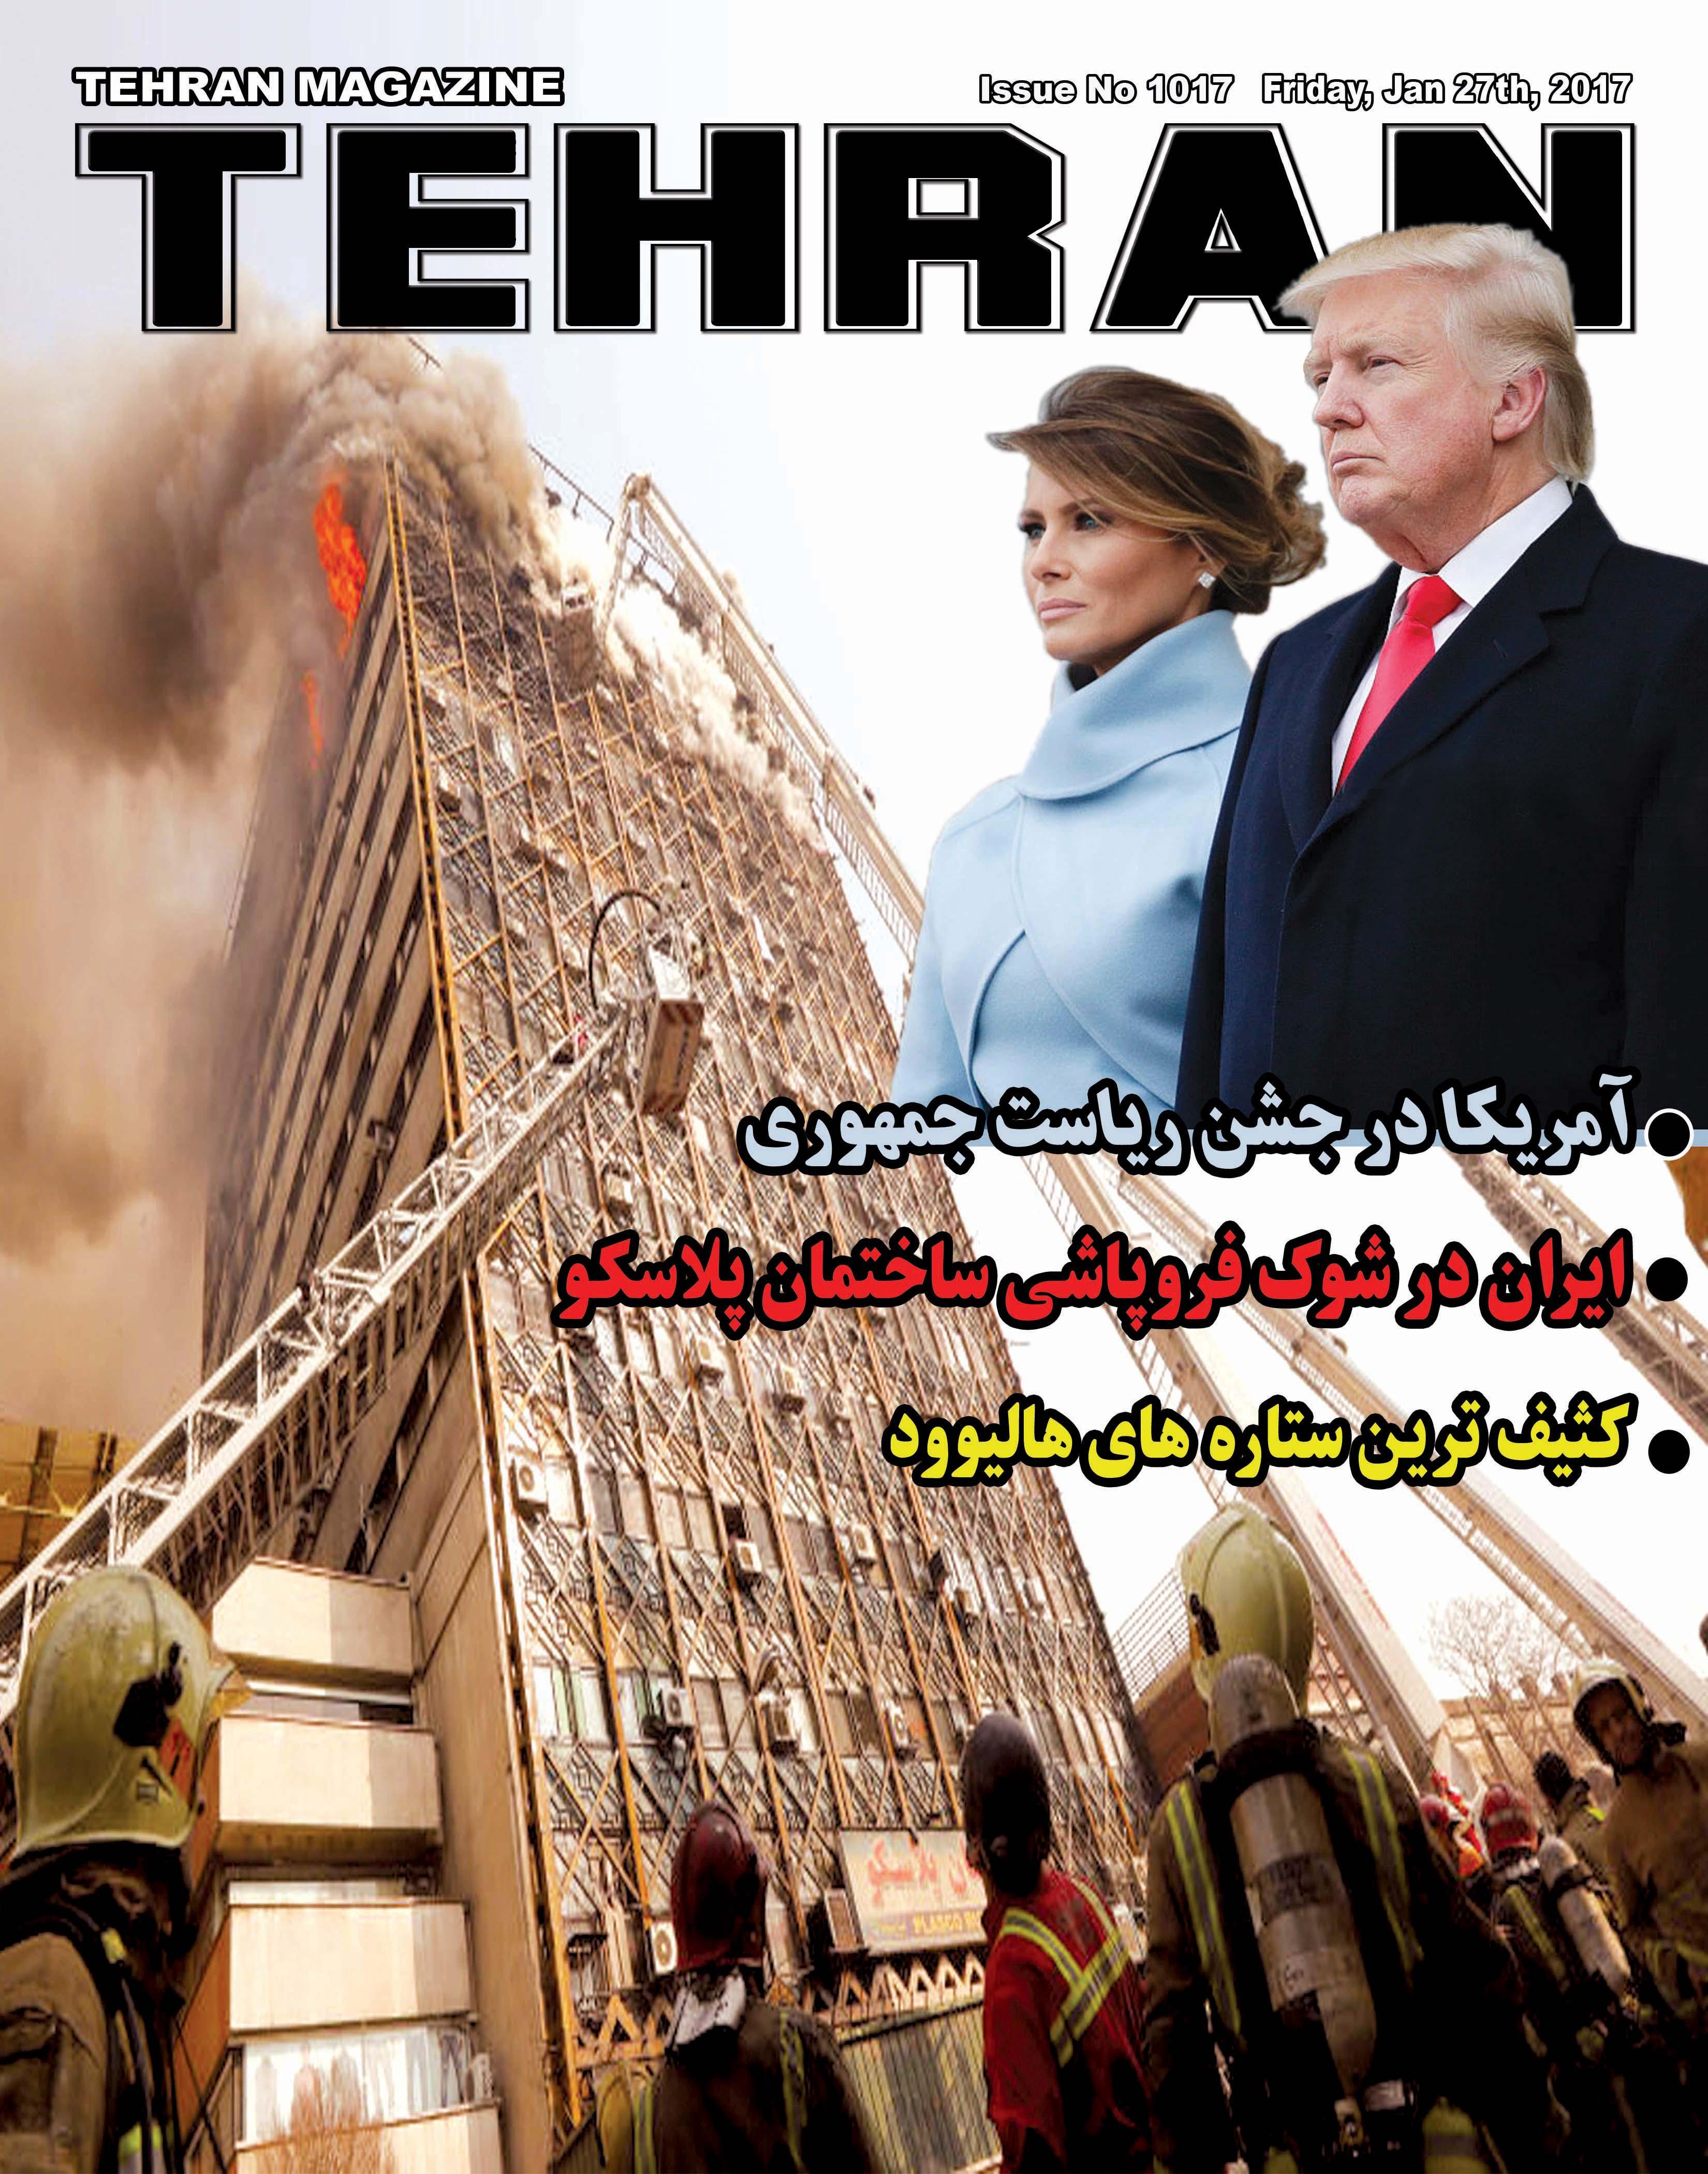 Donald troup